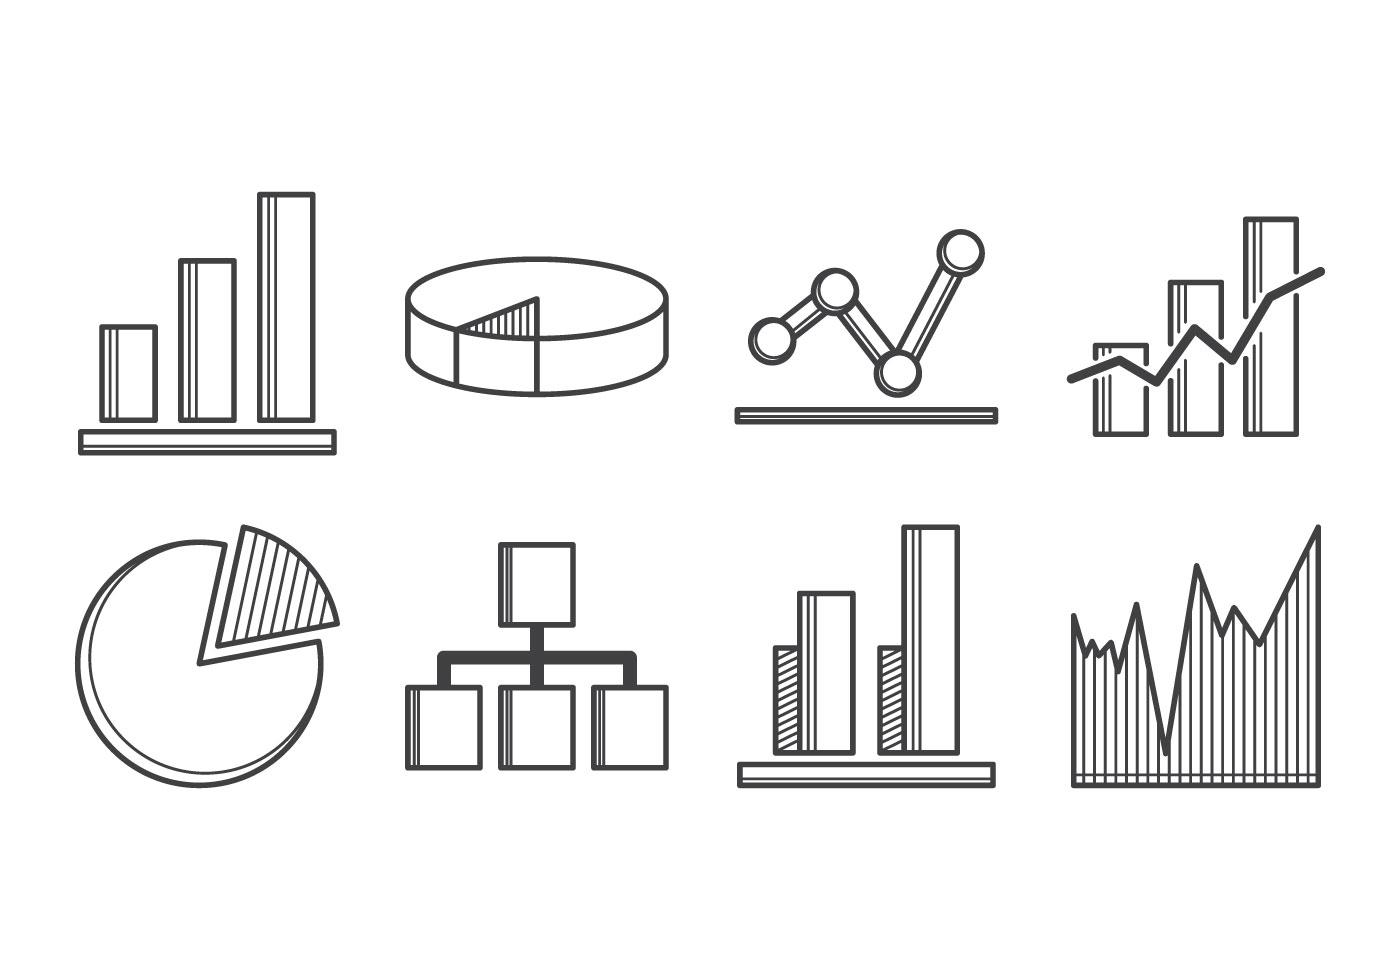 Freier Diagramm Symbol Vektor